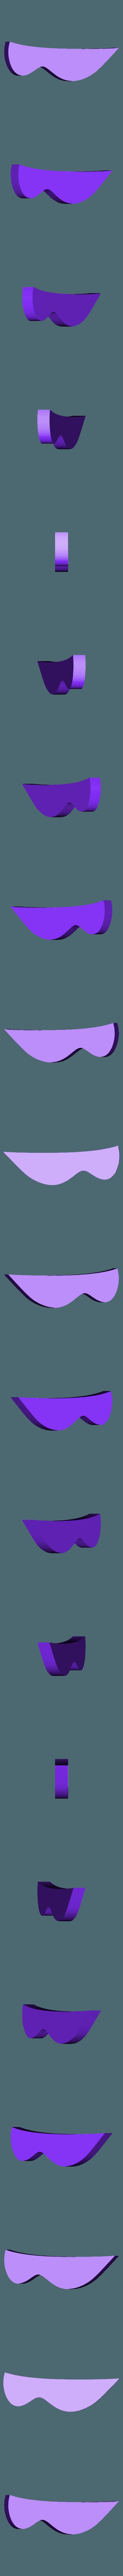 Hoof_02.stl Download free STL file Cow - Harvest Moon • 3D print model, JayOmega